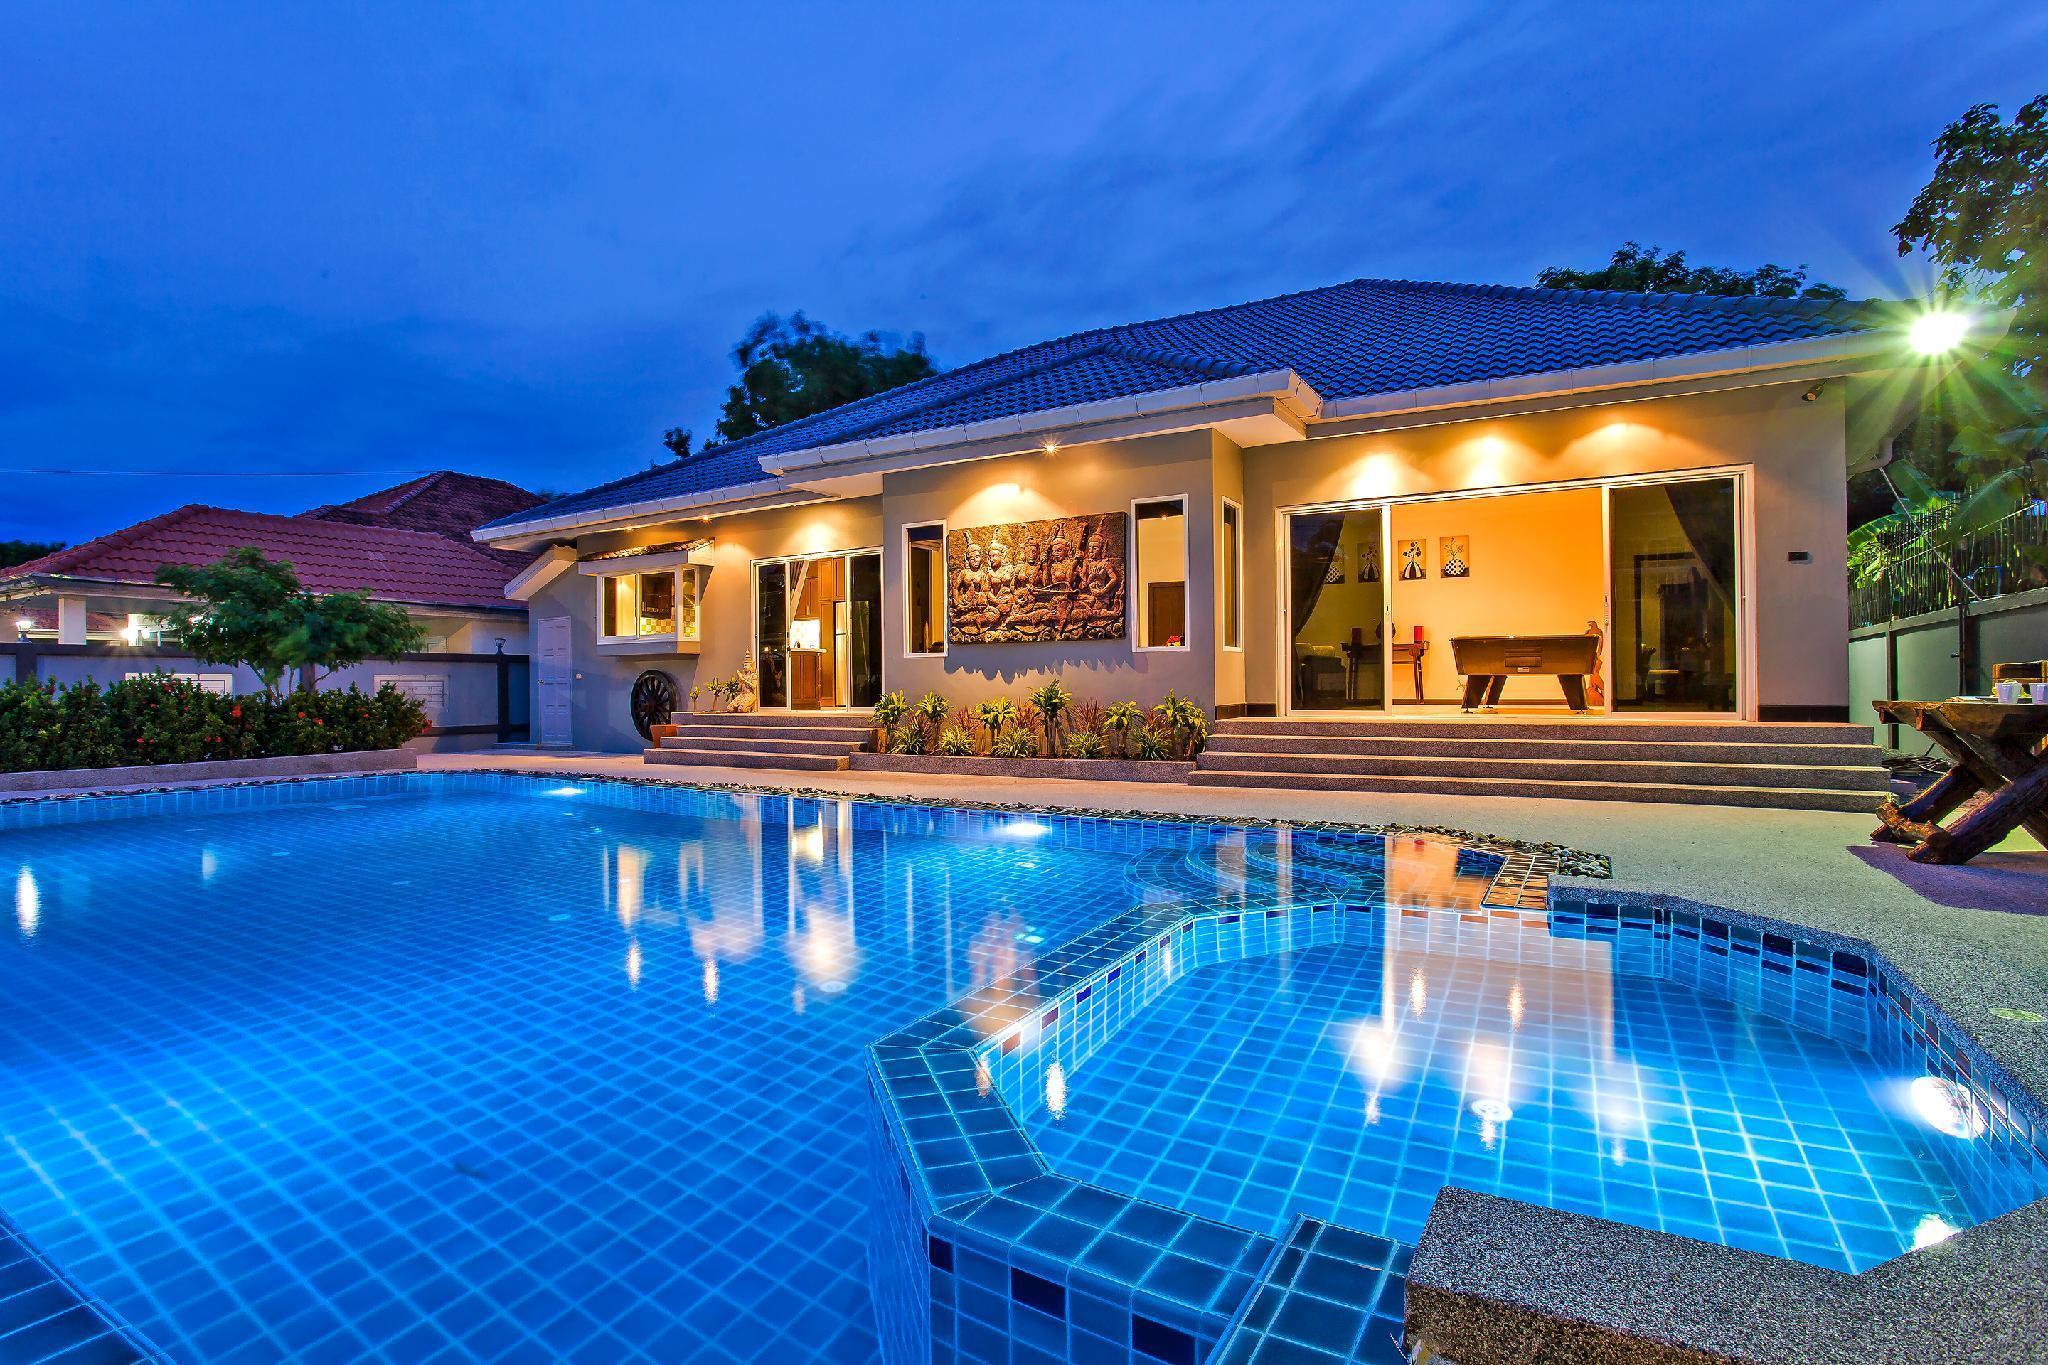 Baan Kinaree | 5 Bed Pool Villa Jomtien Beach วิลลา 5 ห้องนอน 5 ห้องน้ำส่วนตัว ขนาด 207 ตร.ม. – หาดจอมเทียน